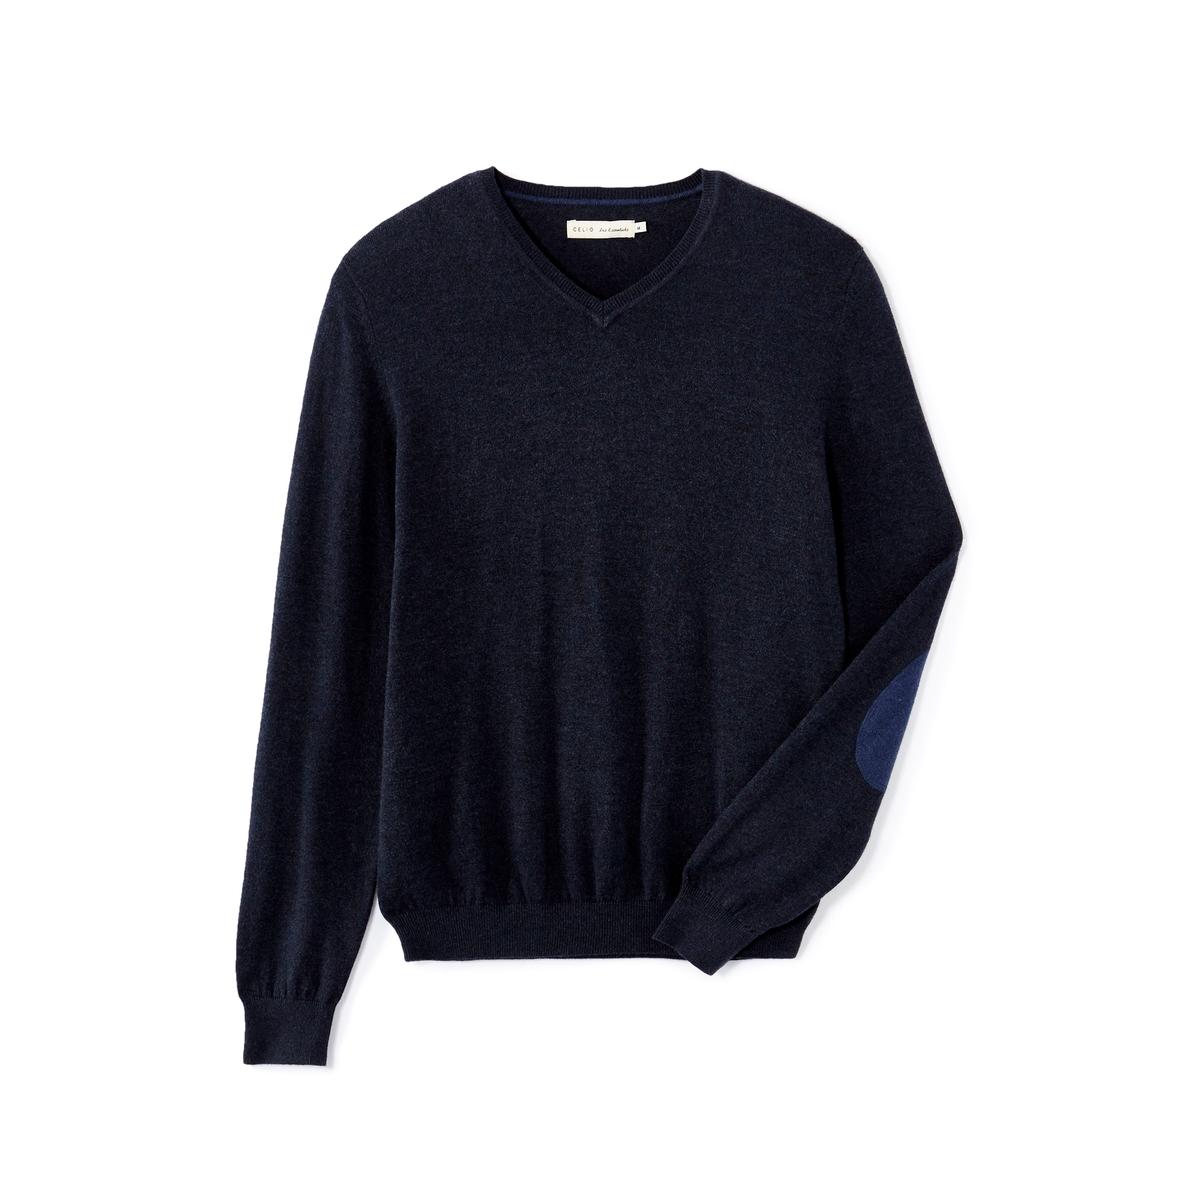 Пуловер с налокотниками Fever